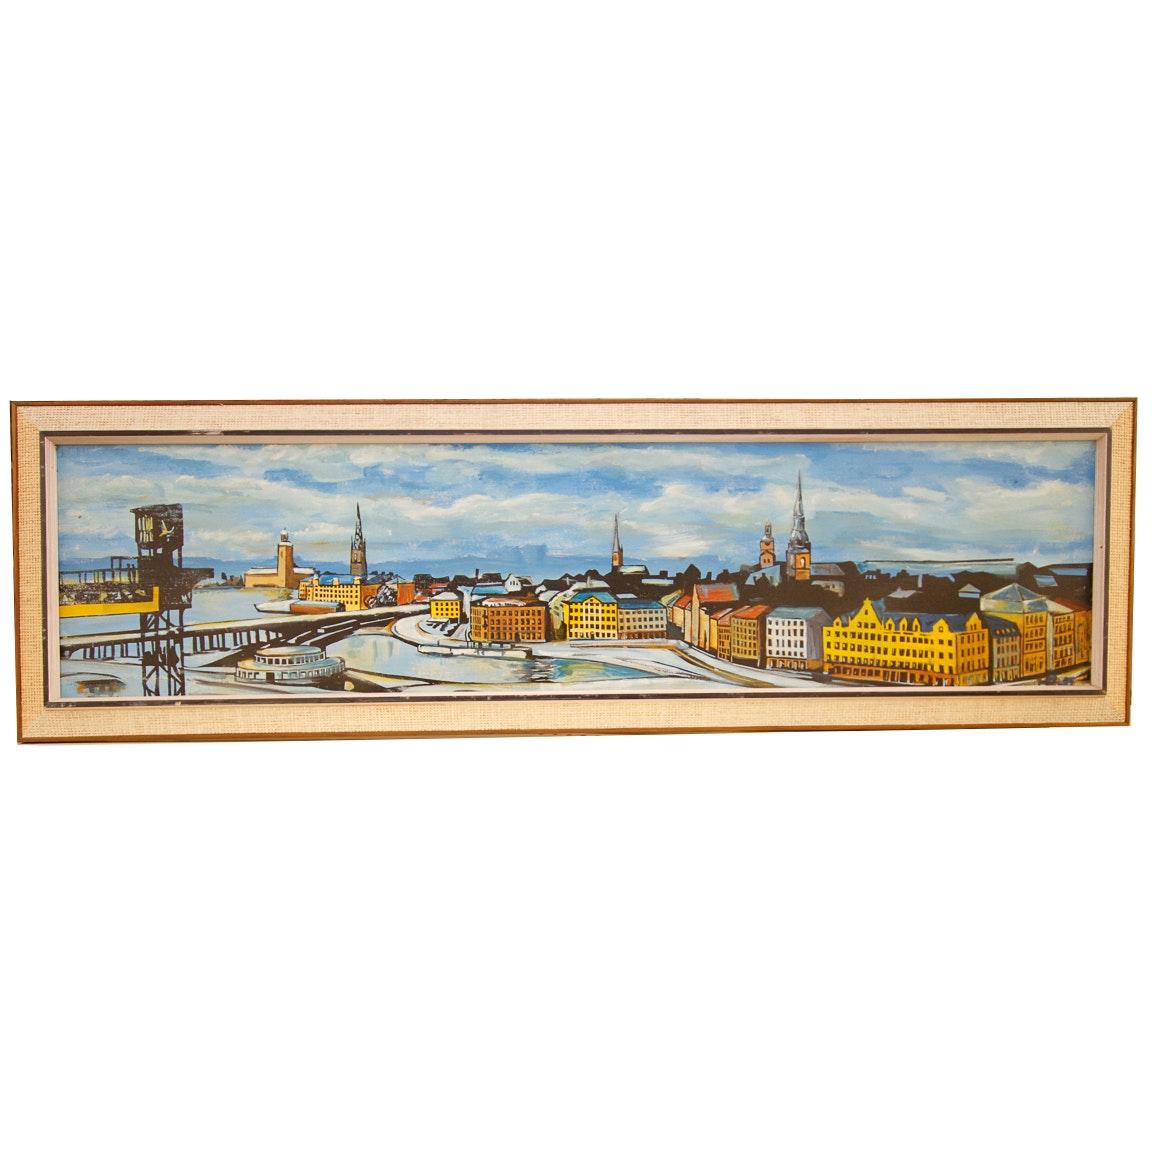 Acrylic on Canvas Coastal Painting